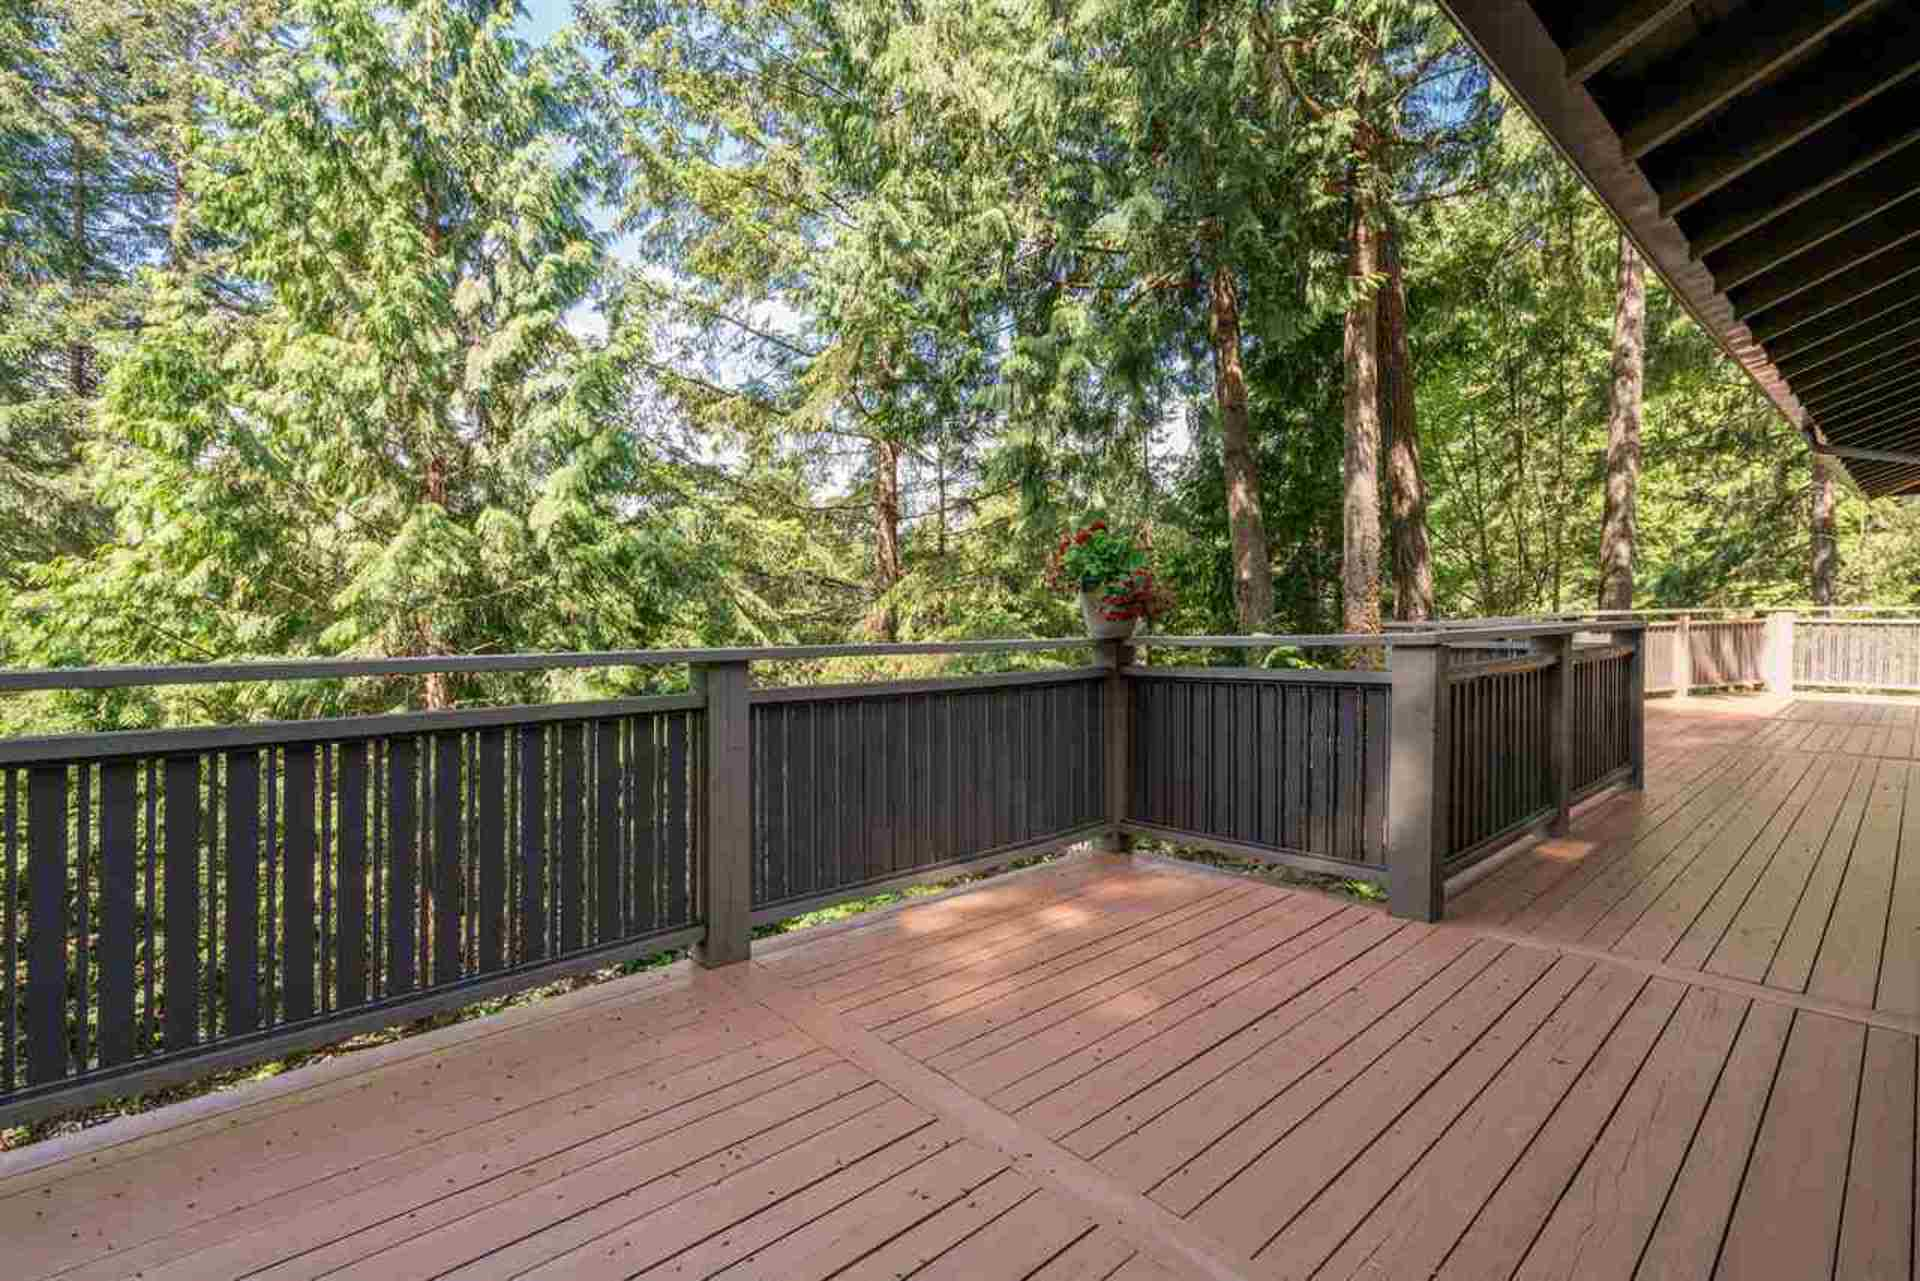 4620-woodburn-road-cypress-park-estates-west-vancouver-17 at 4620 Woodburn Road, Cypress Park Estates, West Vancouver